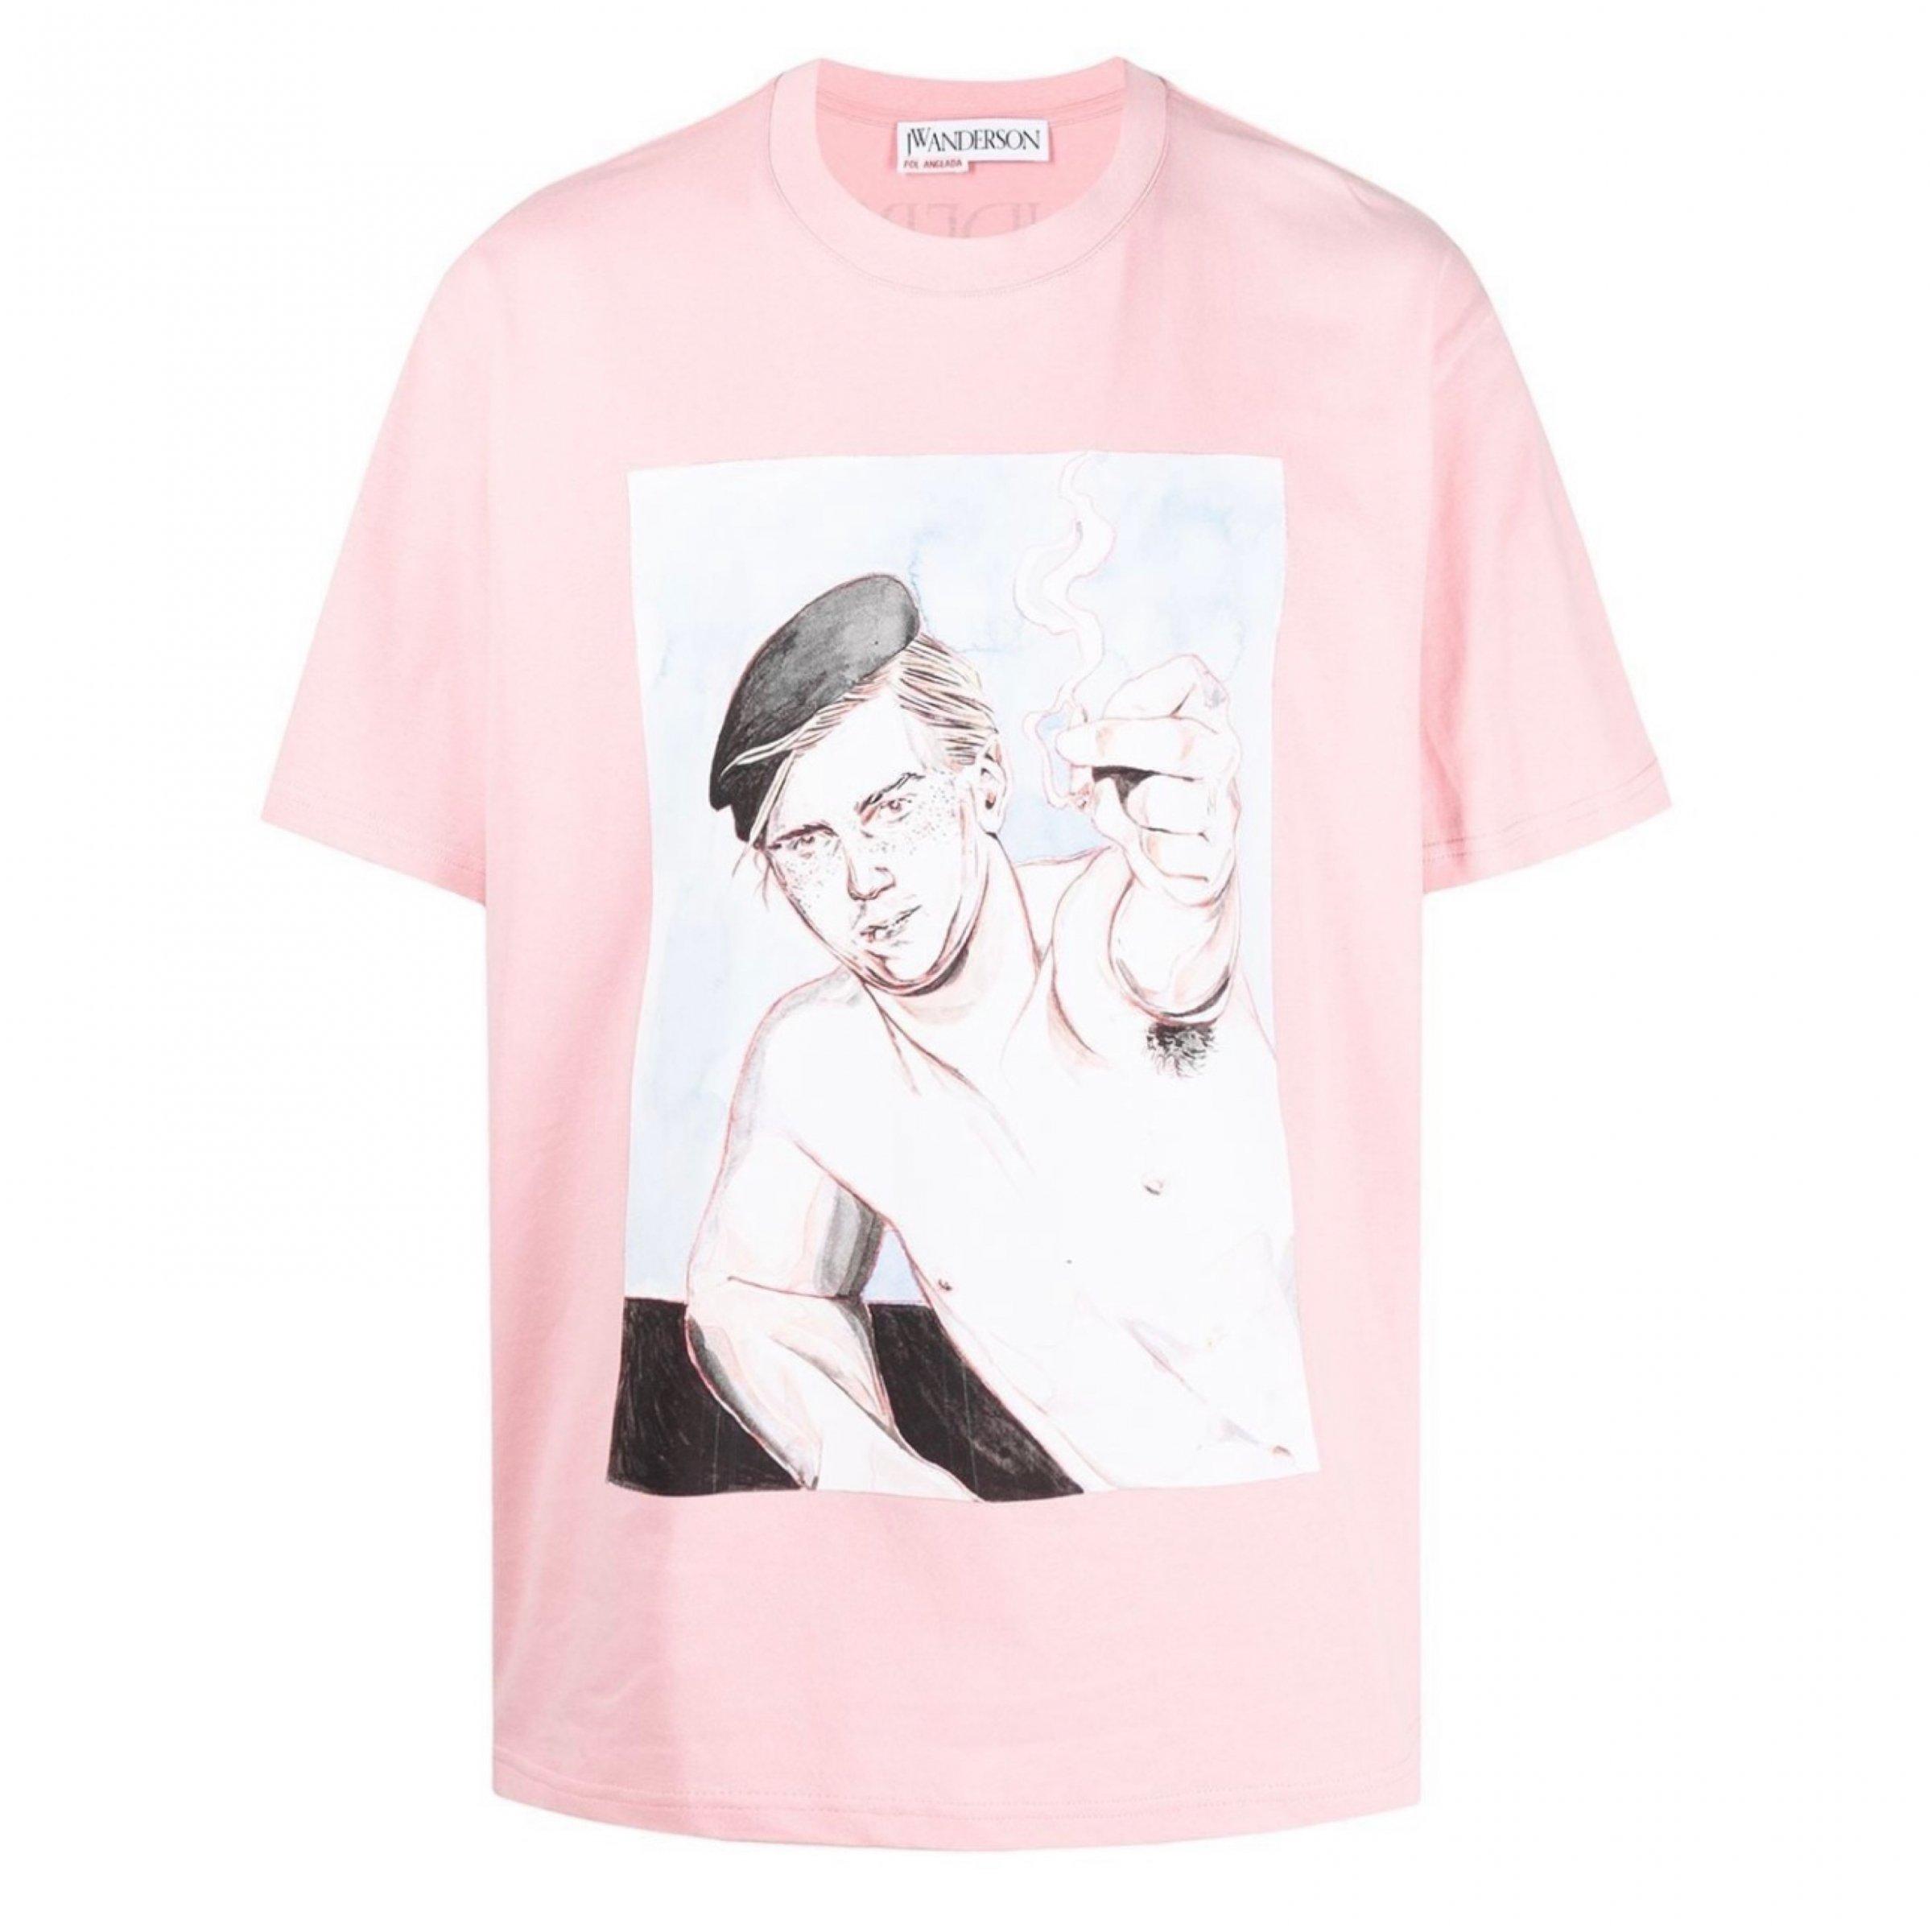 【JW ANDERSON】<br>オーバーサイズ プリントTEEシャツ